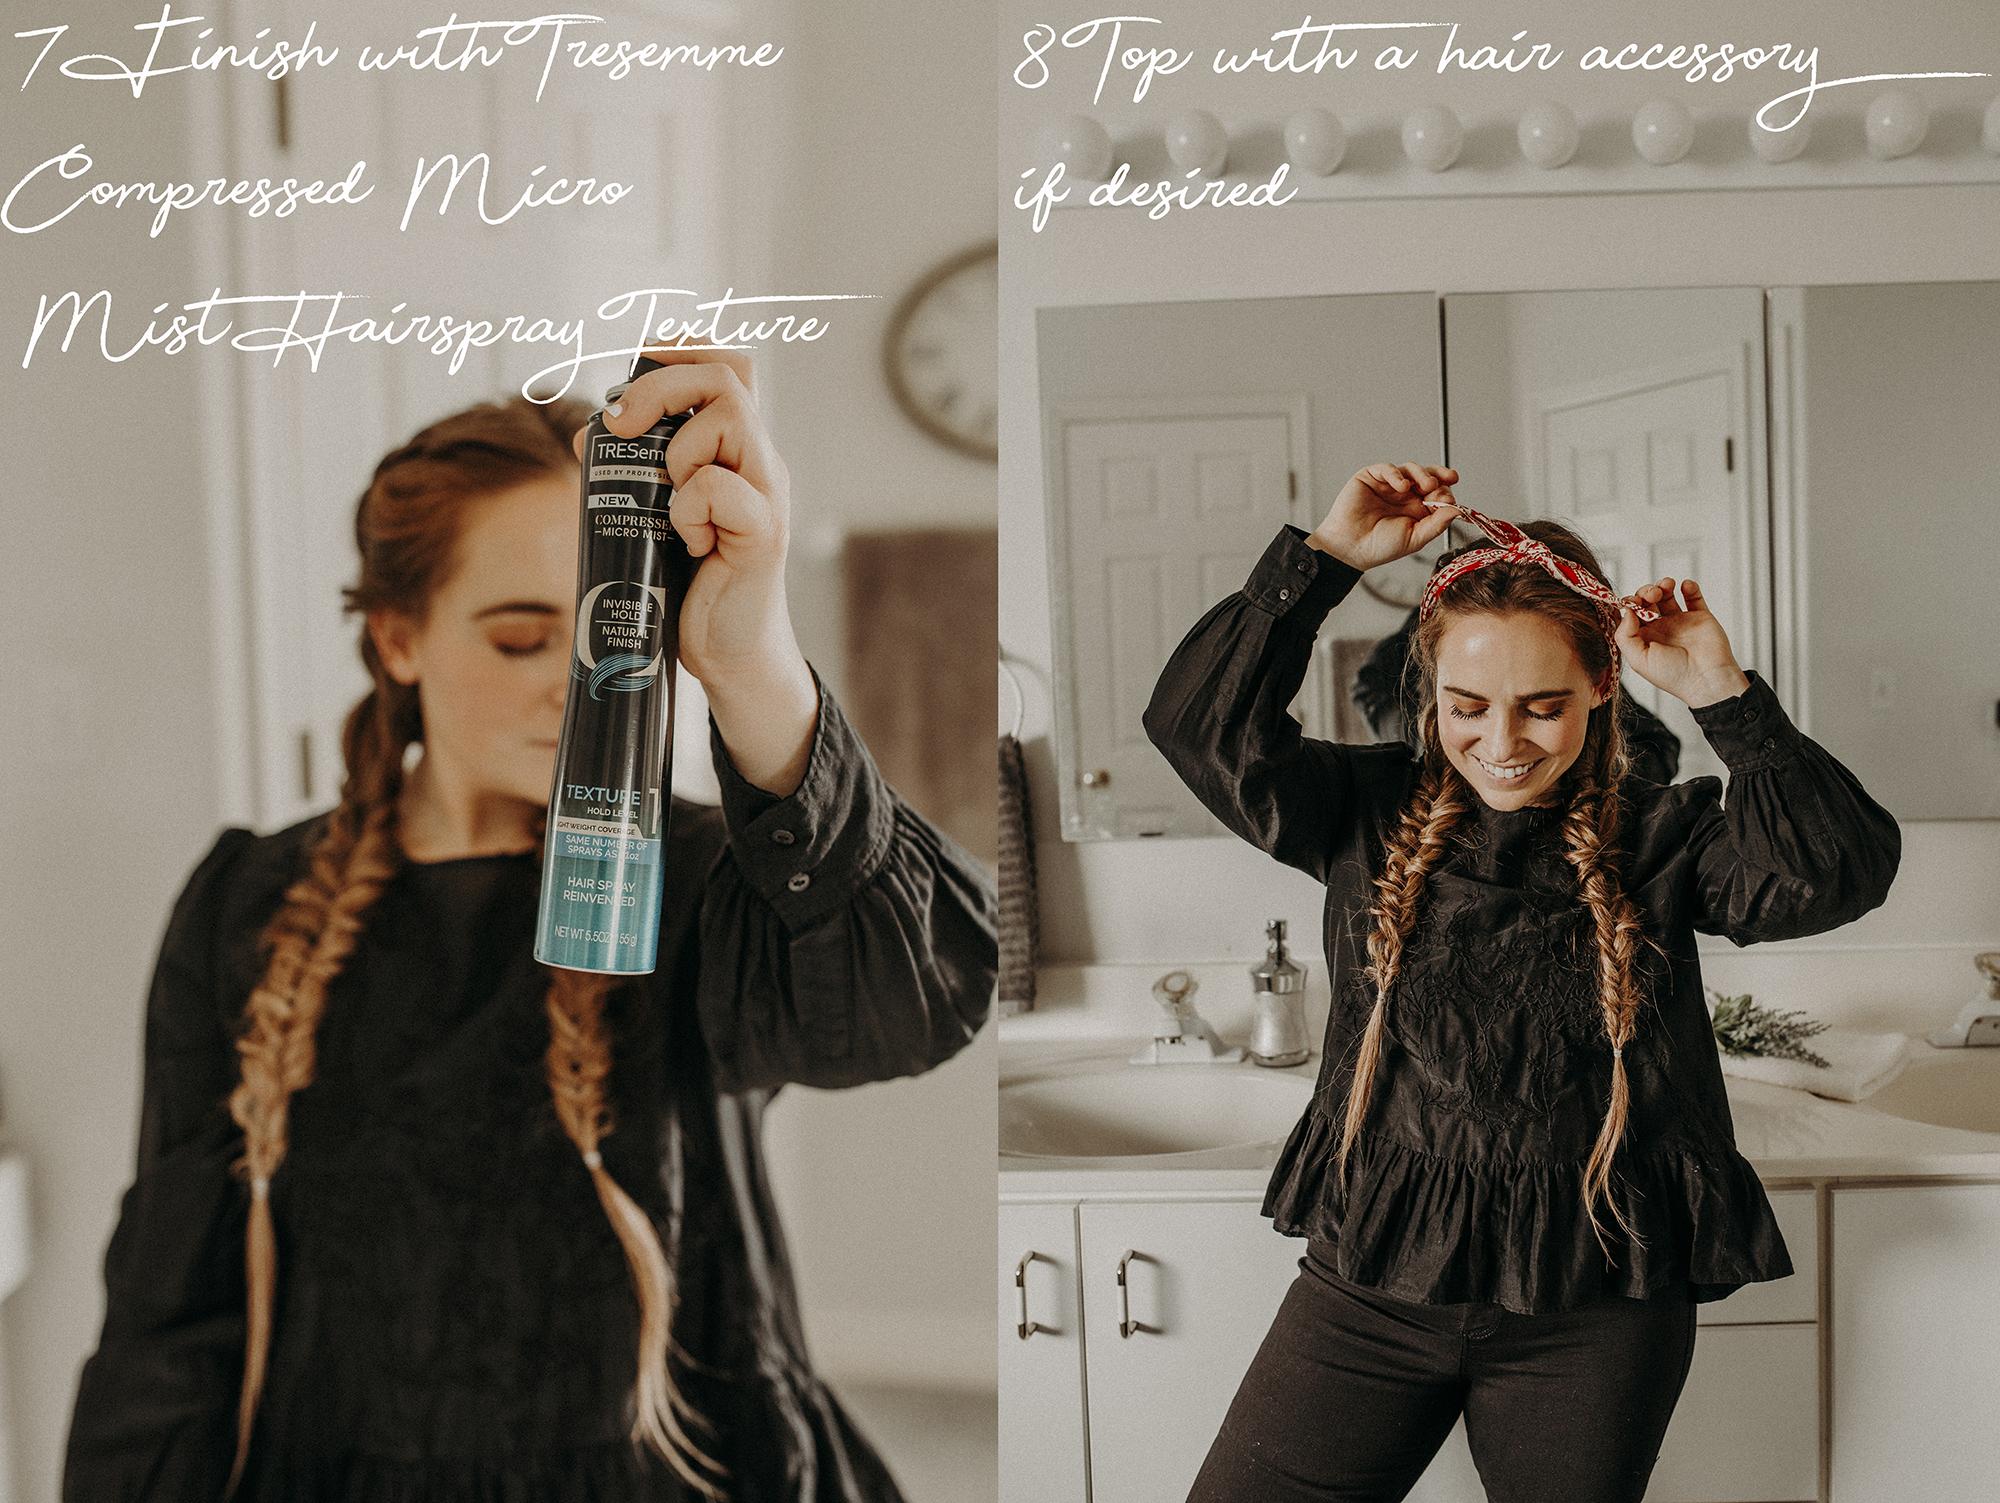 Tresseme-Micro-Mist-Hairspray-Review-Infinity-Braid-Tutorial-43.jpg